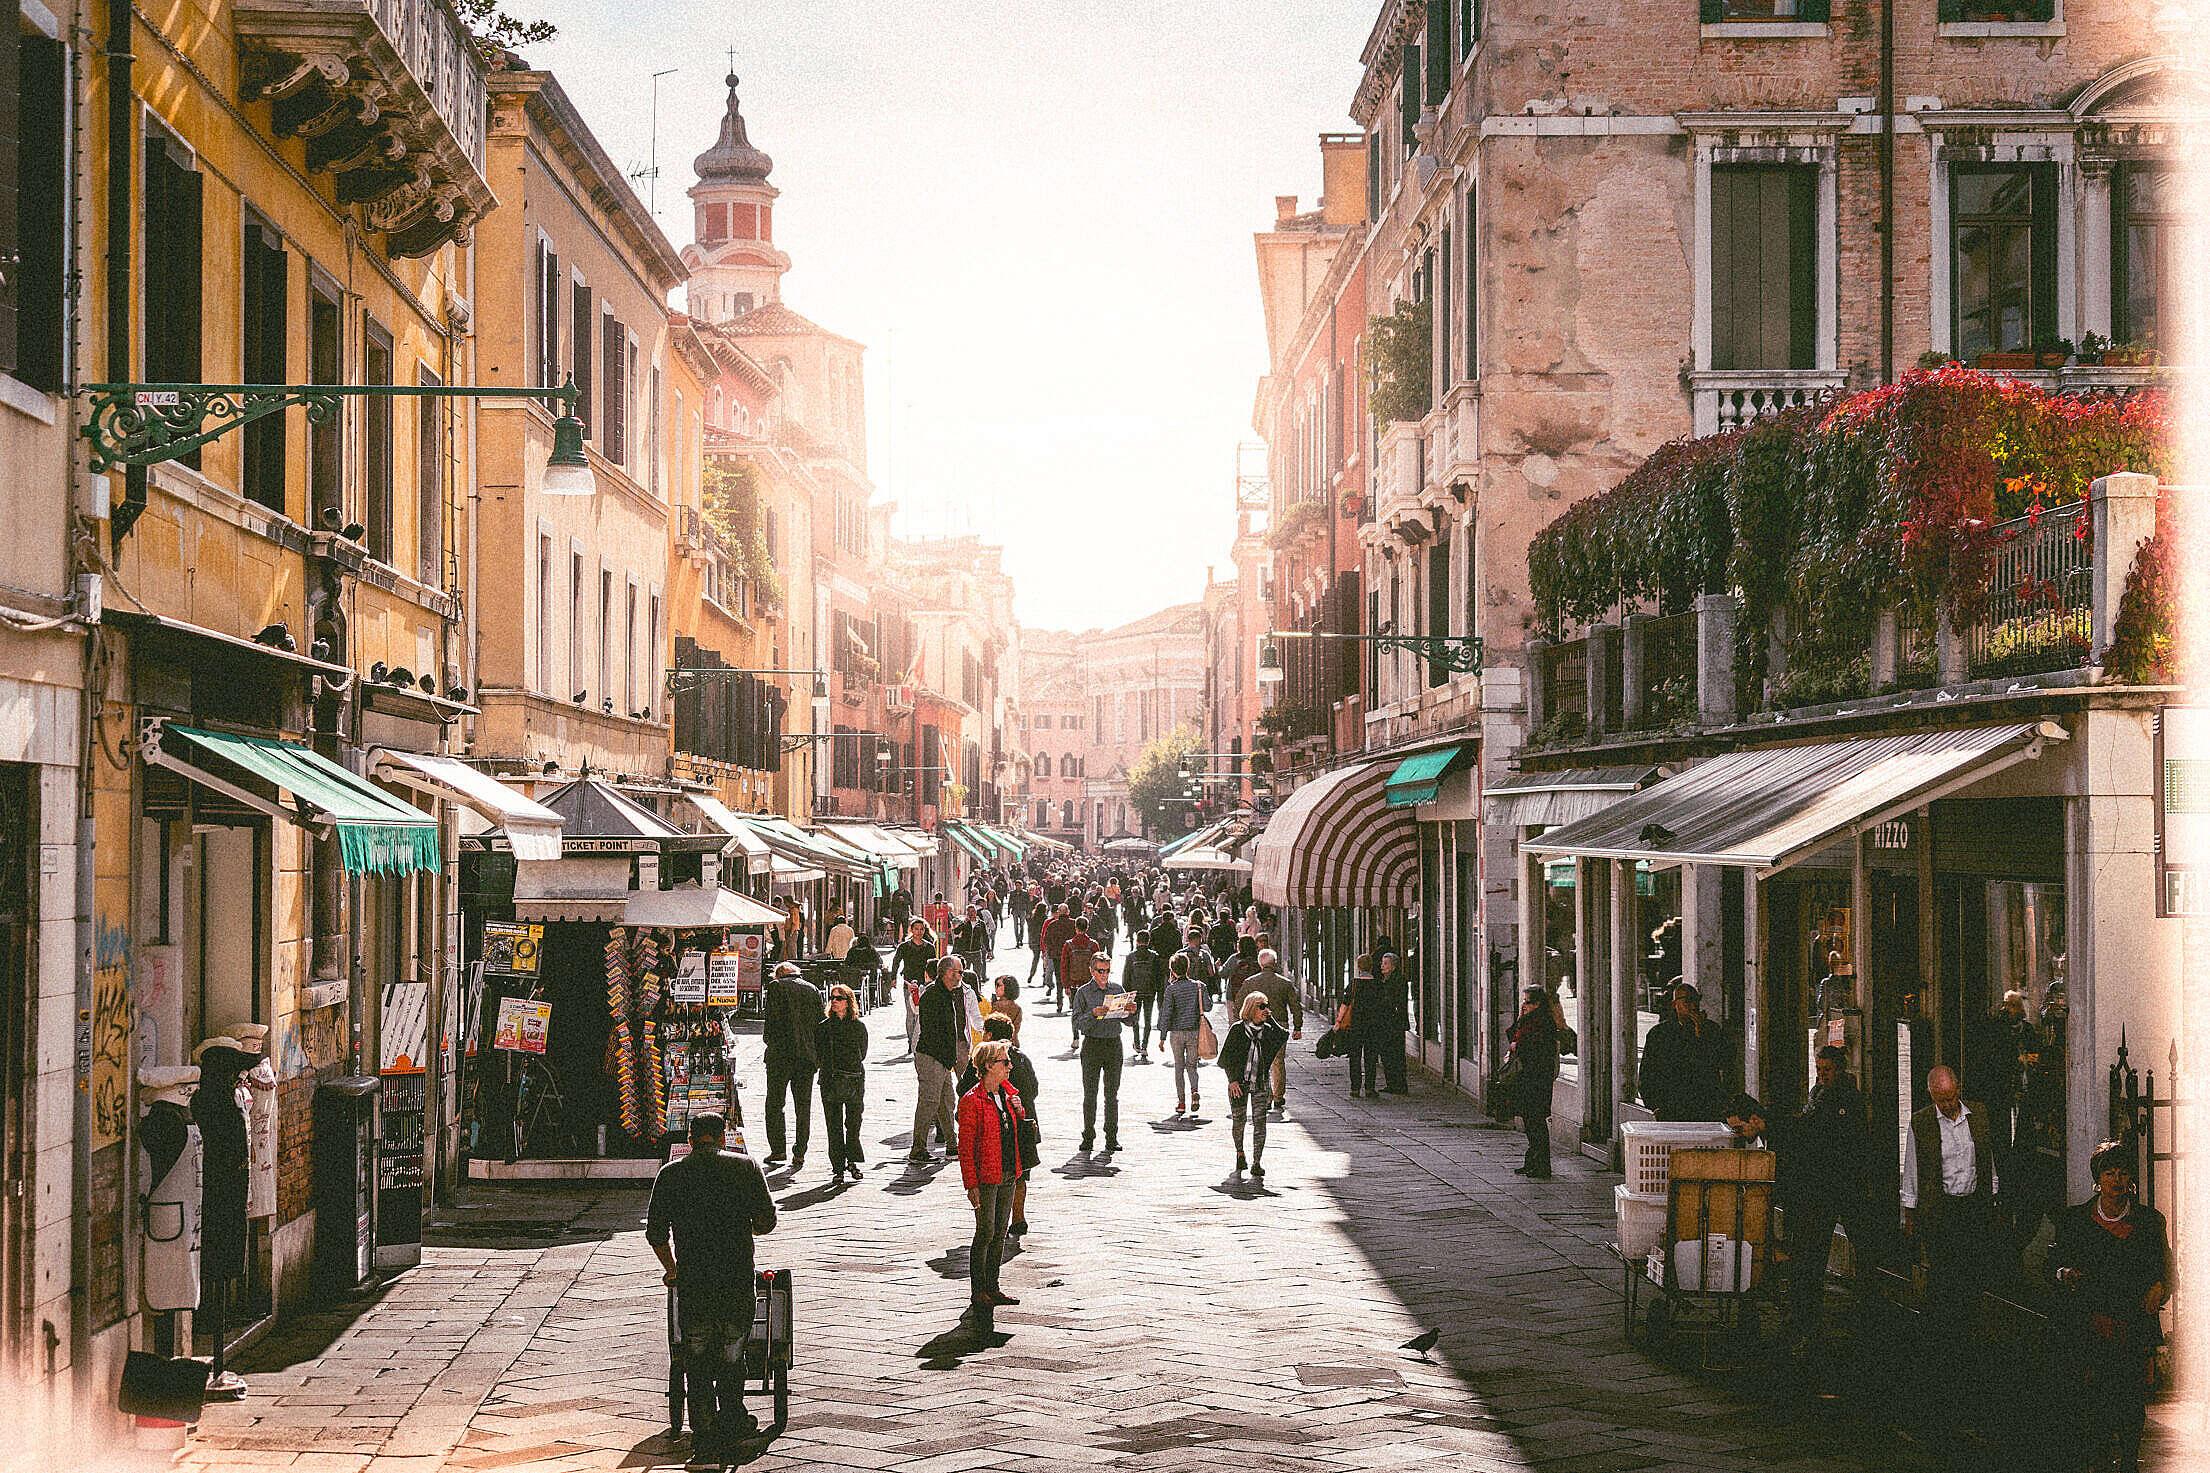 Busy Street in Venice, Italy Free Stock Photo